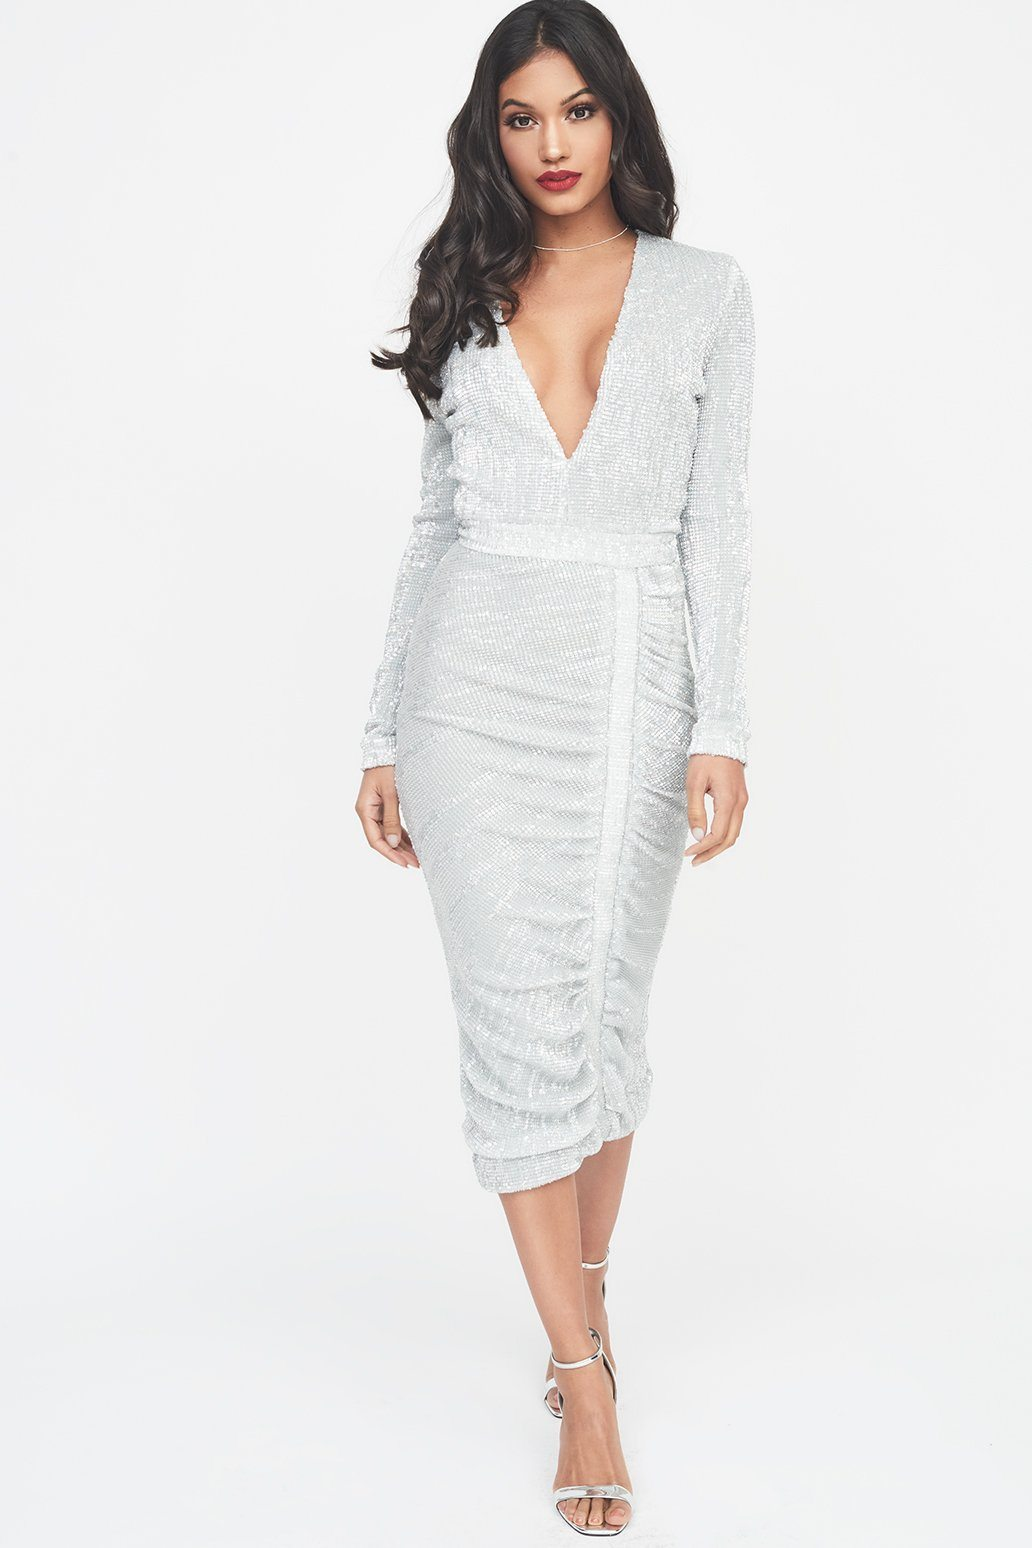 Image of Signature Silver Iridescent Sequin Midi Dress